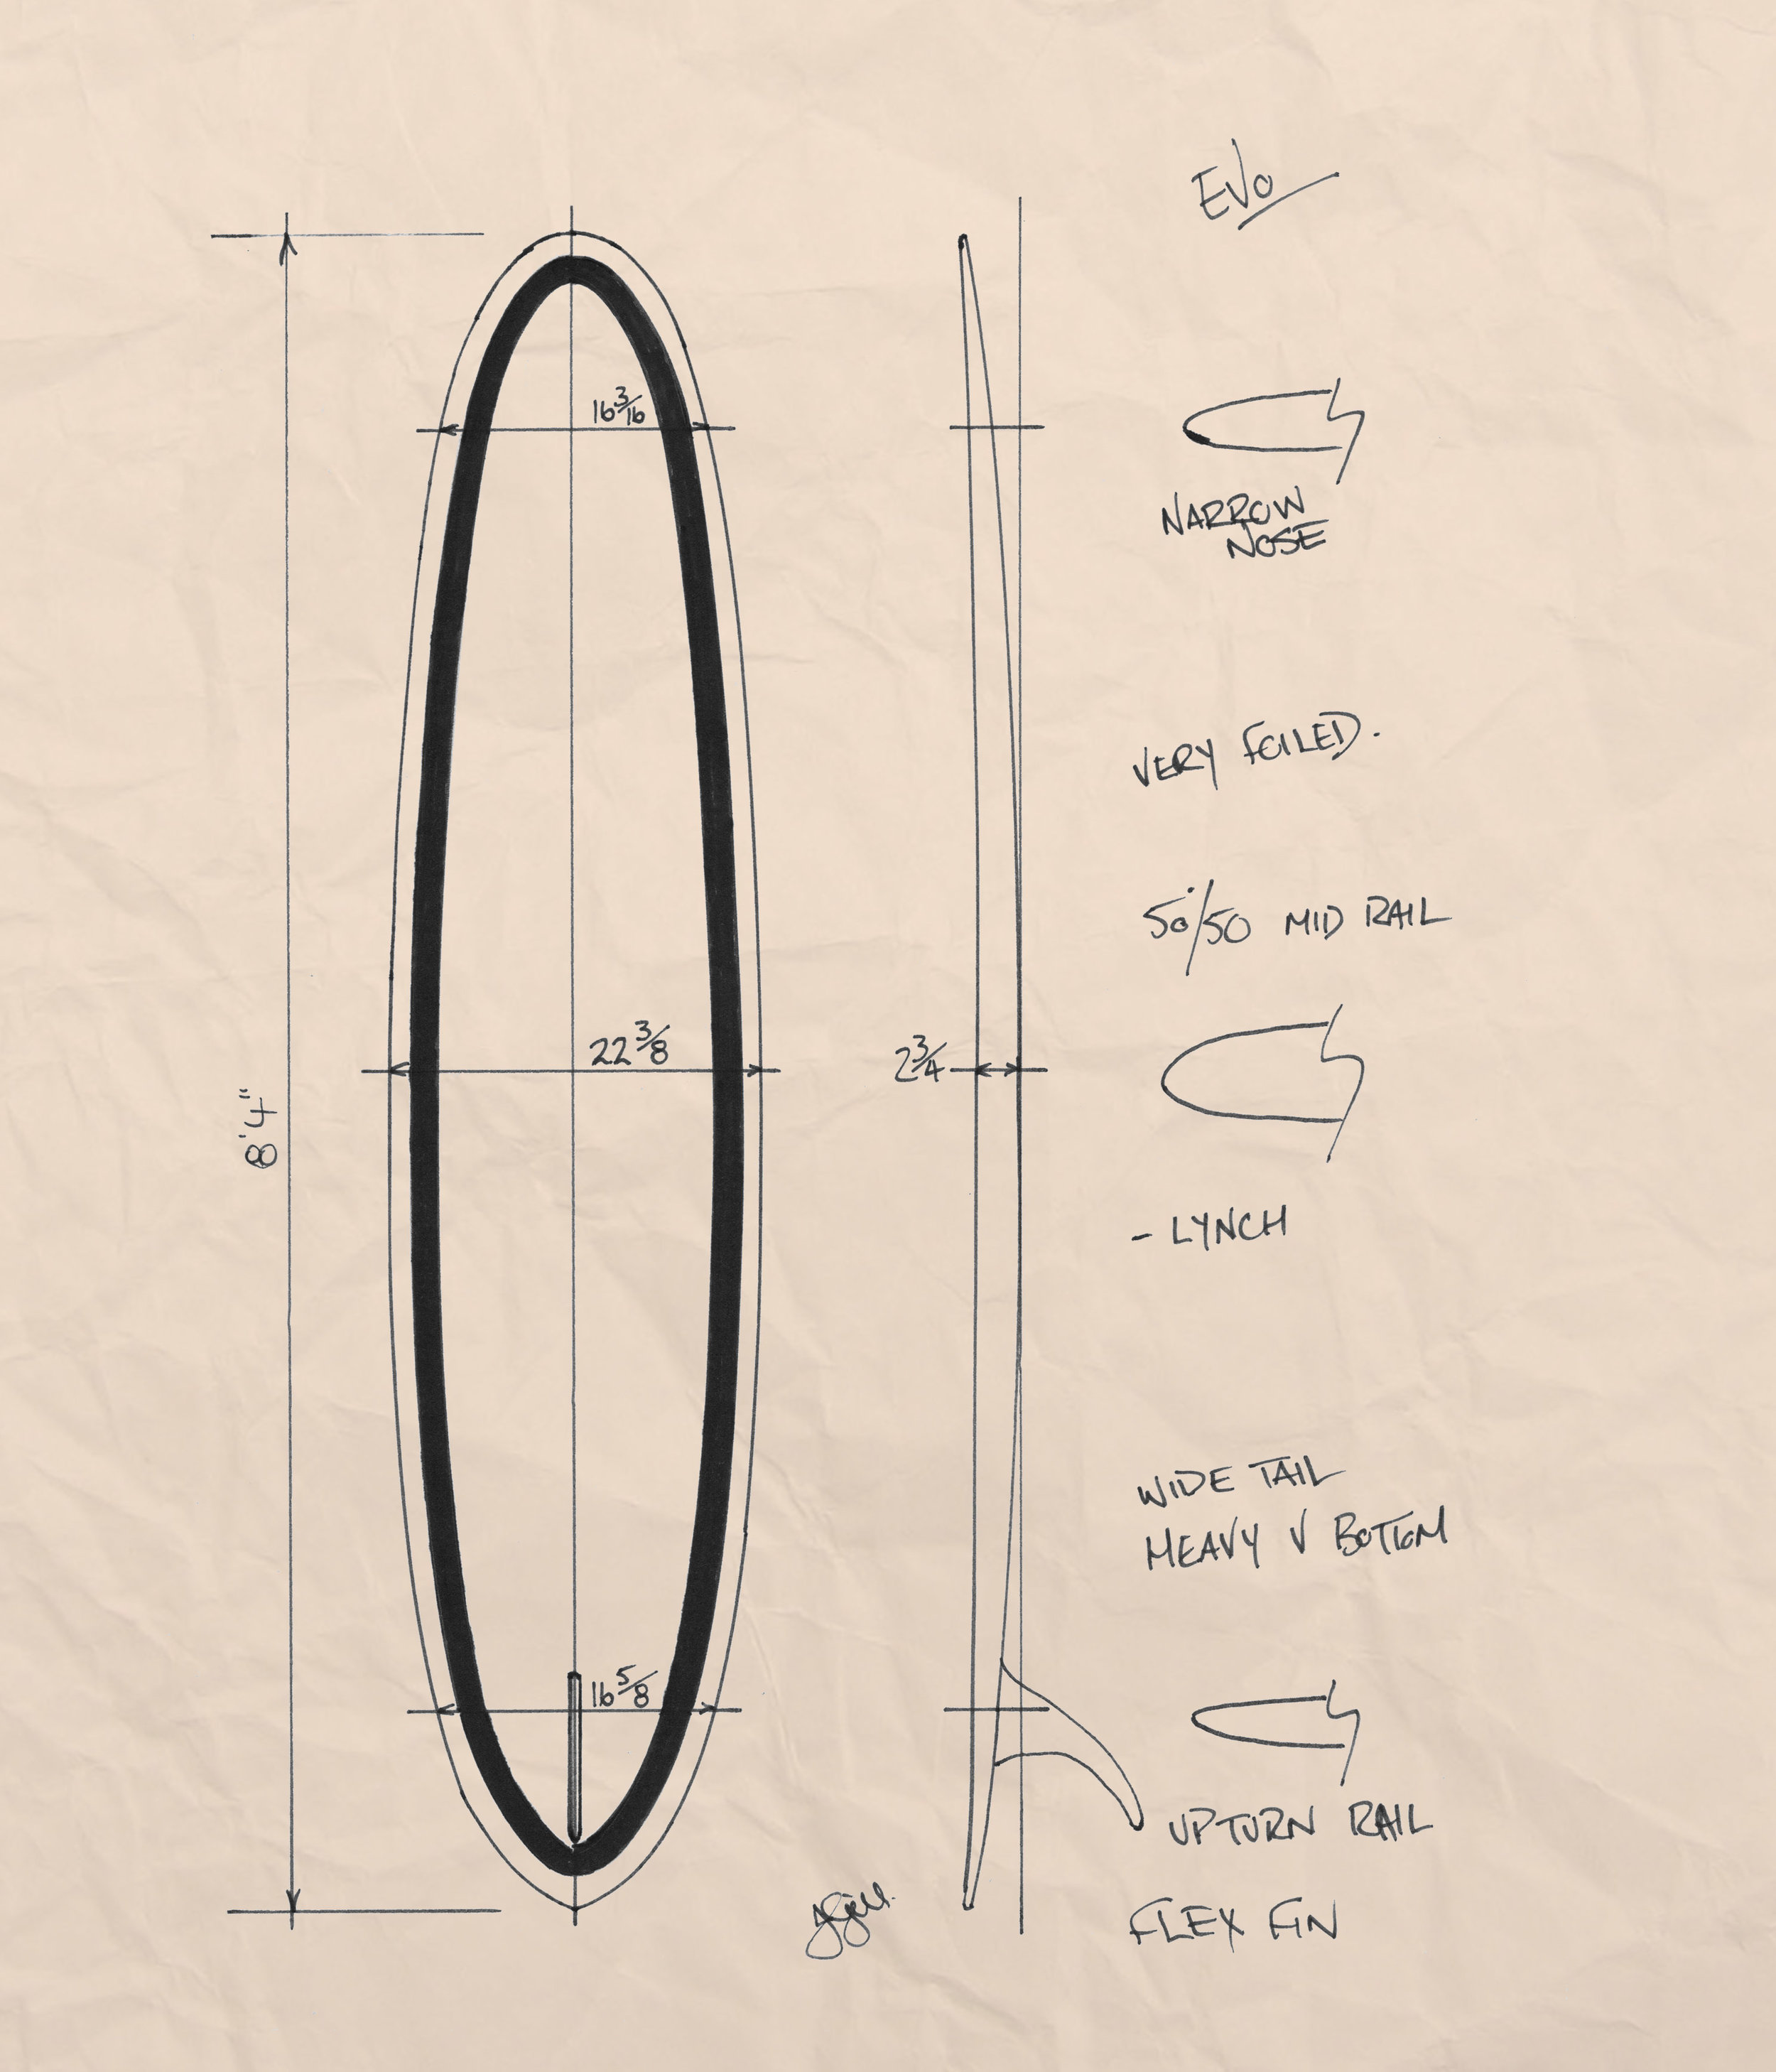 evo_blueprint_paper.jpg